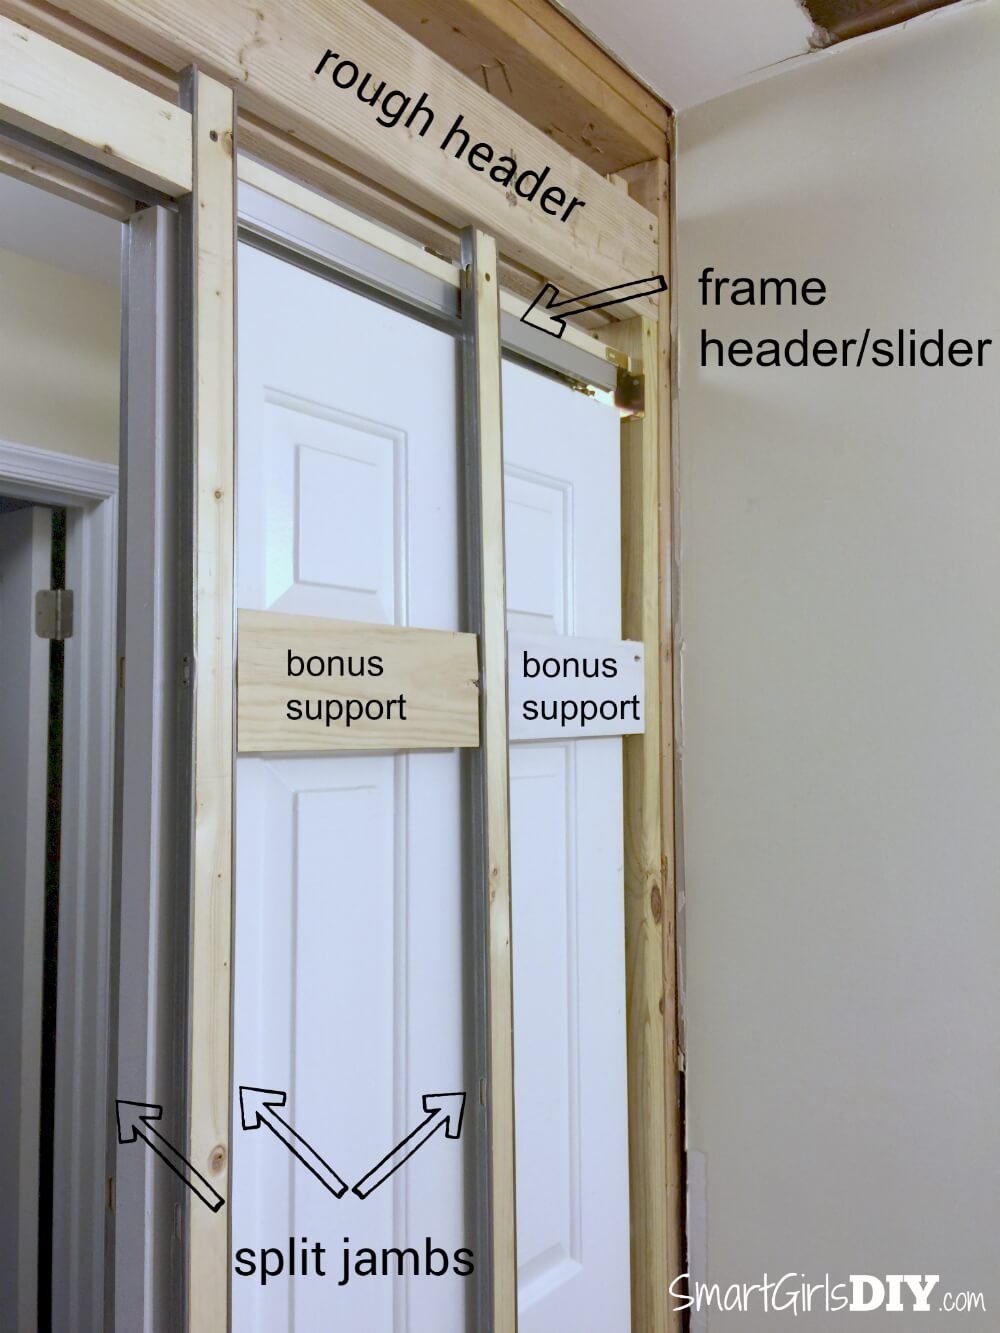 Parts Of A Pocket Door Frame    Tutorial By Smart Girls DIY